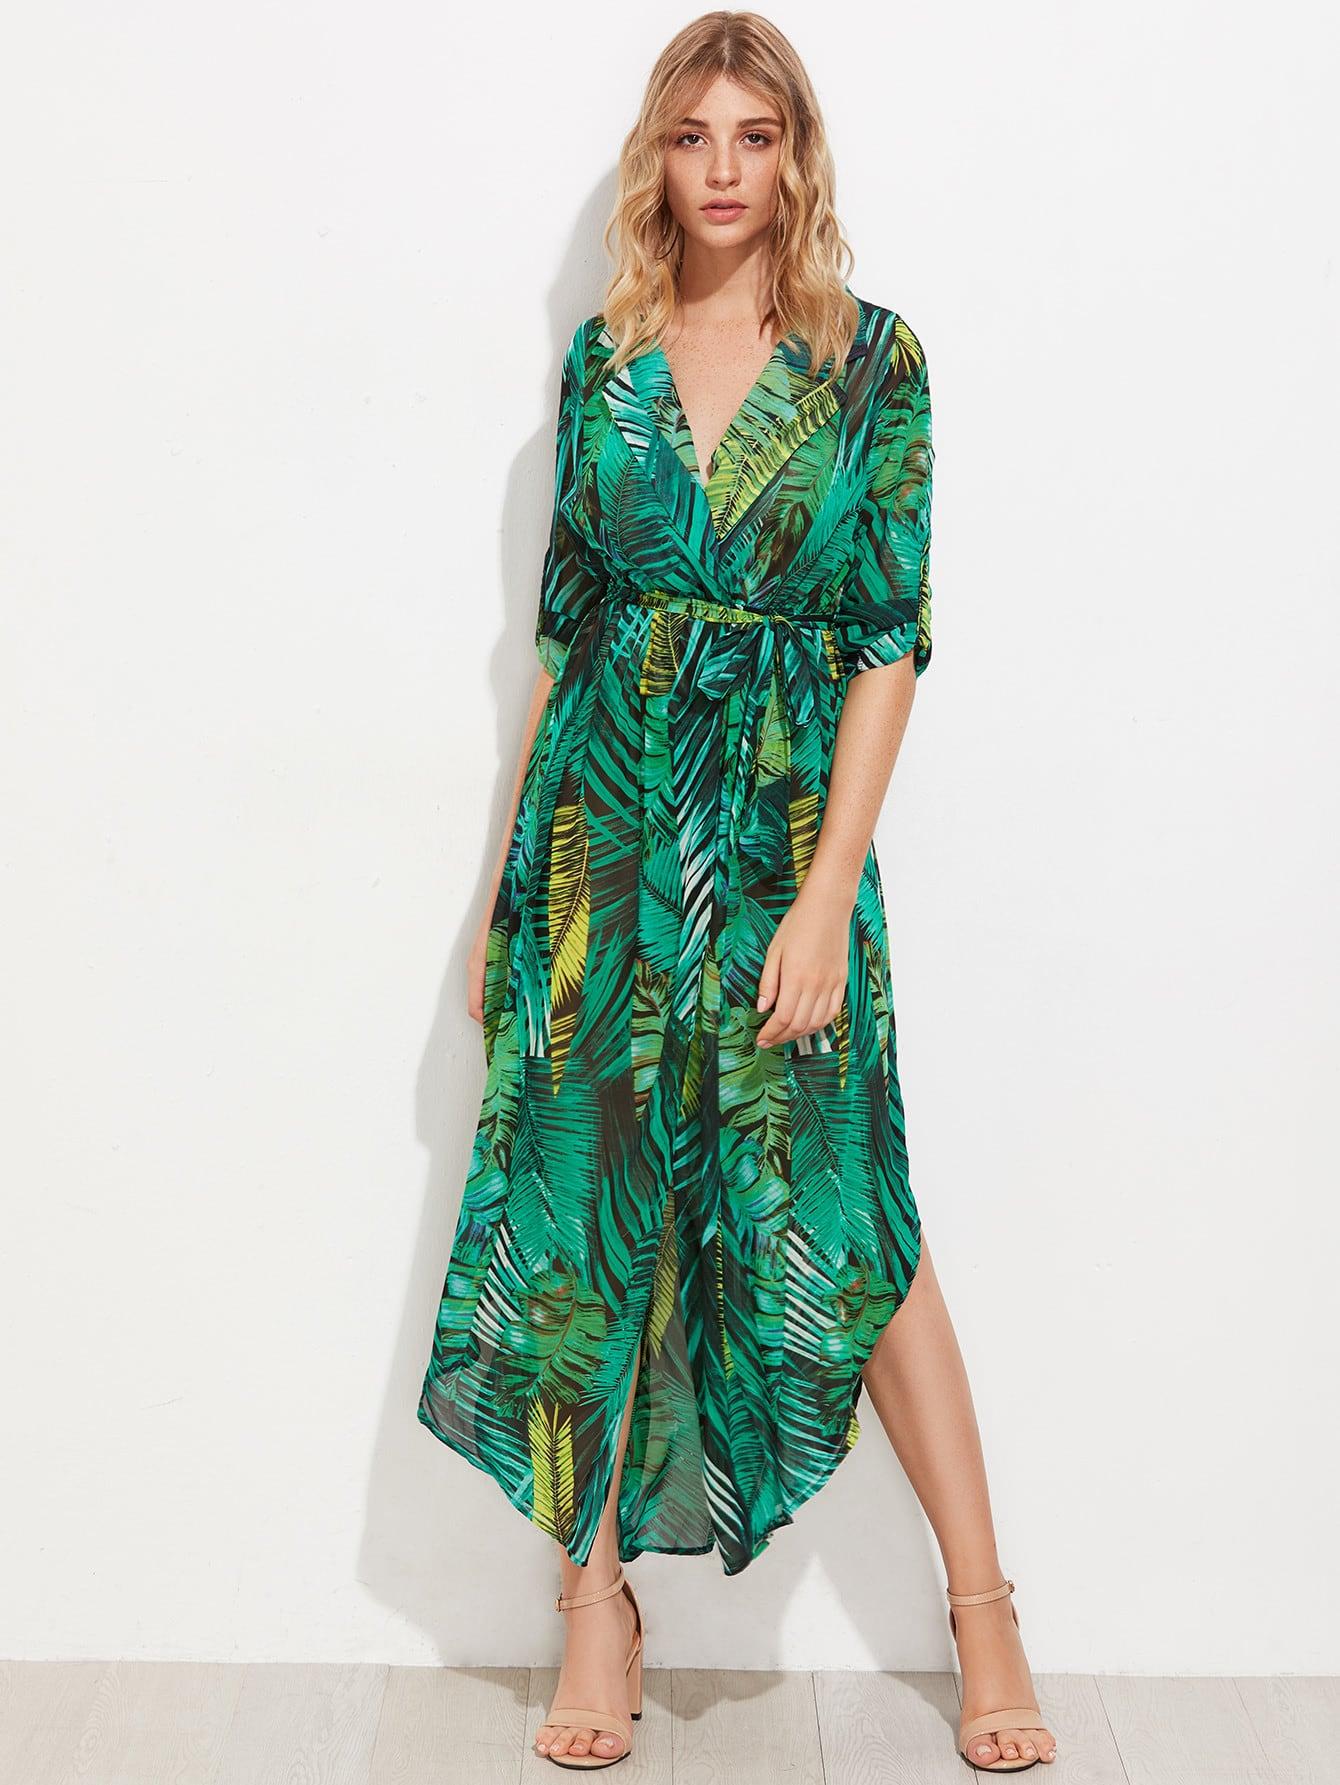 Allover Palm Leaf Print Curved Hem Shirt Dress pocket patch curved hem snake skin print shirt